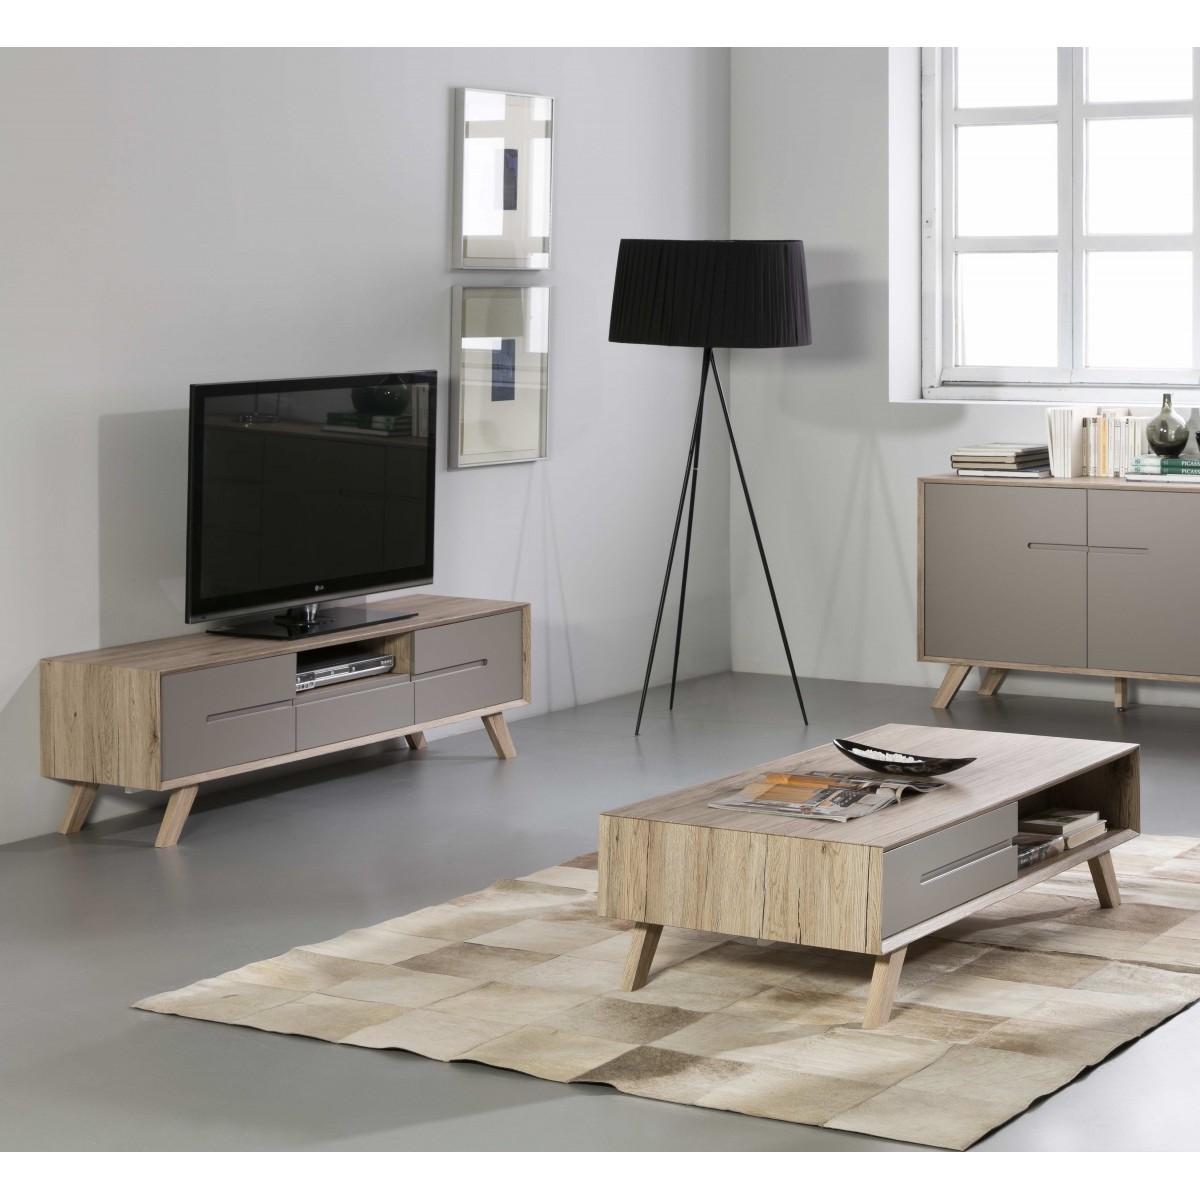 promo pack meuble tv table basse olie taupe. Black Bedroom Furniture Sets. Home Design Ideas